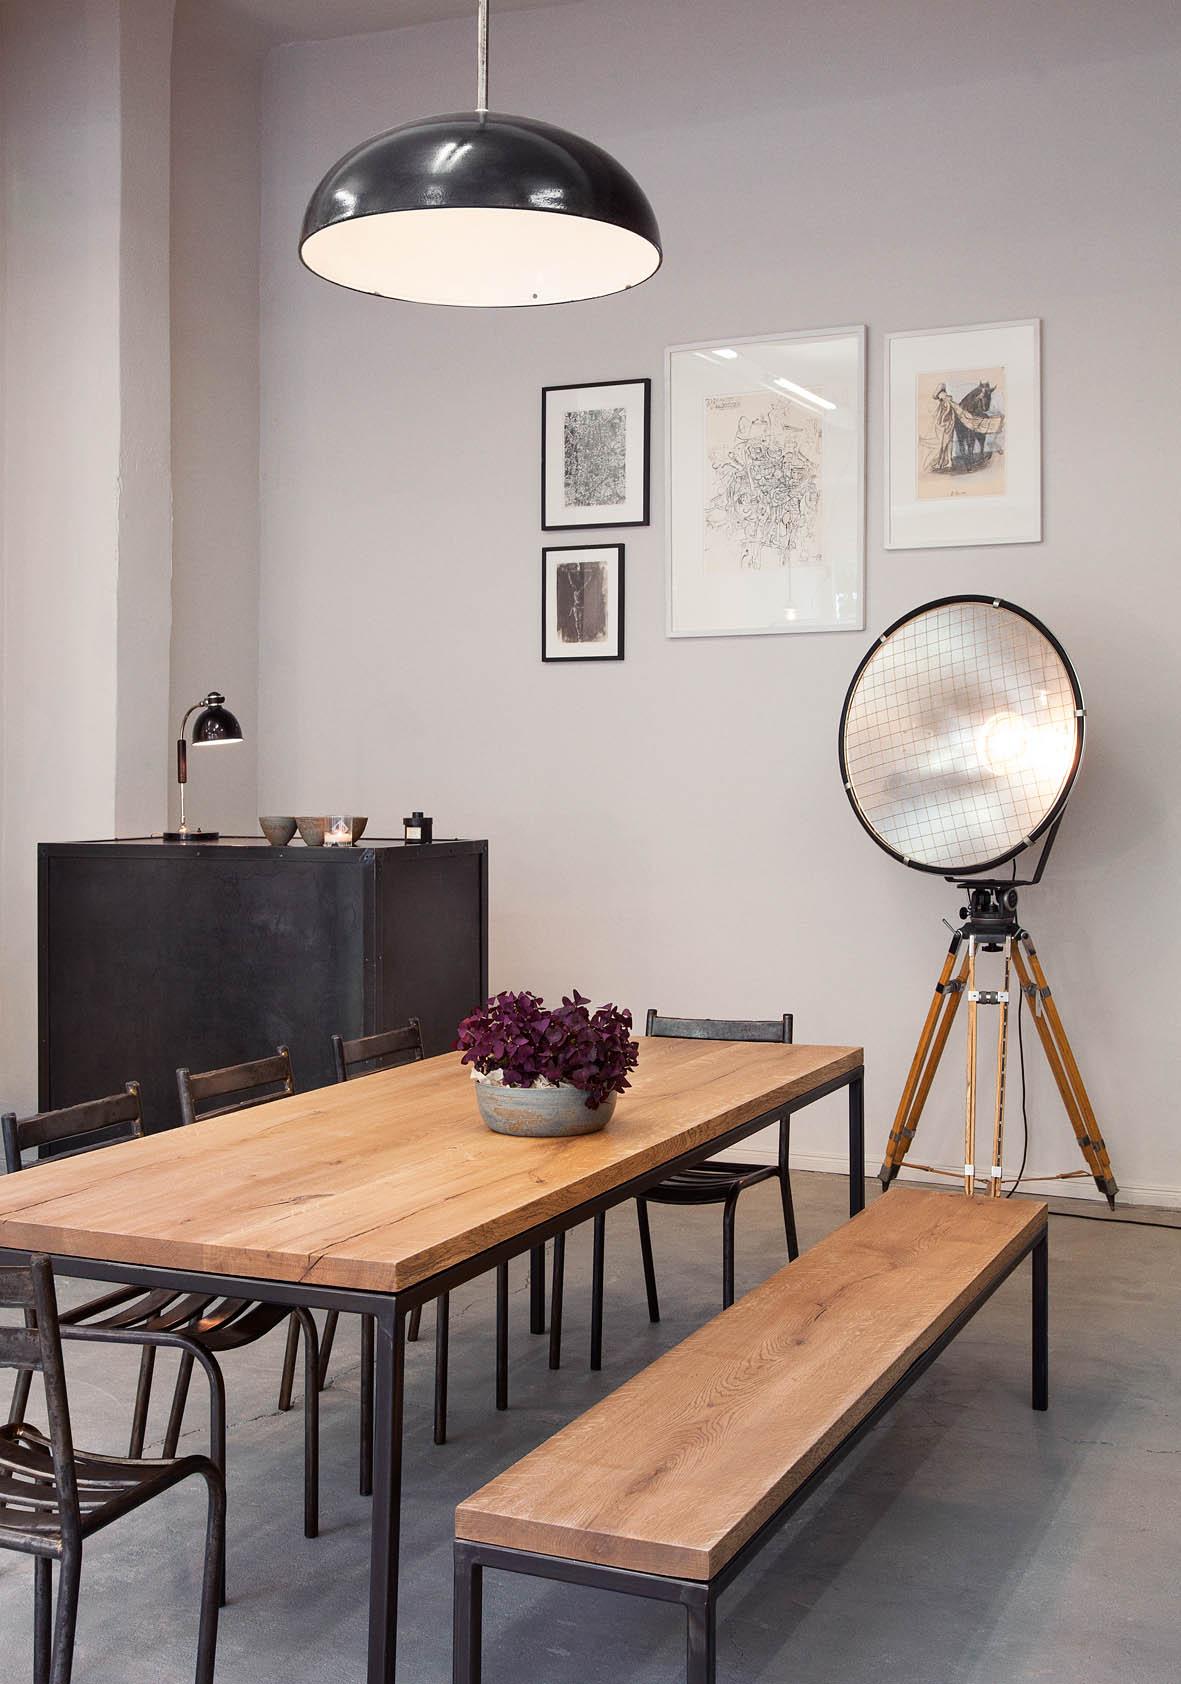 journelles maison gro e sch ne esstische aus massivholz von objets trouv s e15 co journelles. Black Bedroom Furniture Sets. Home Design Ideas